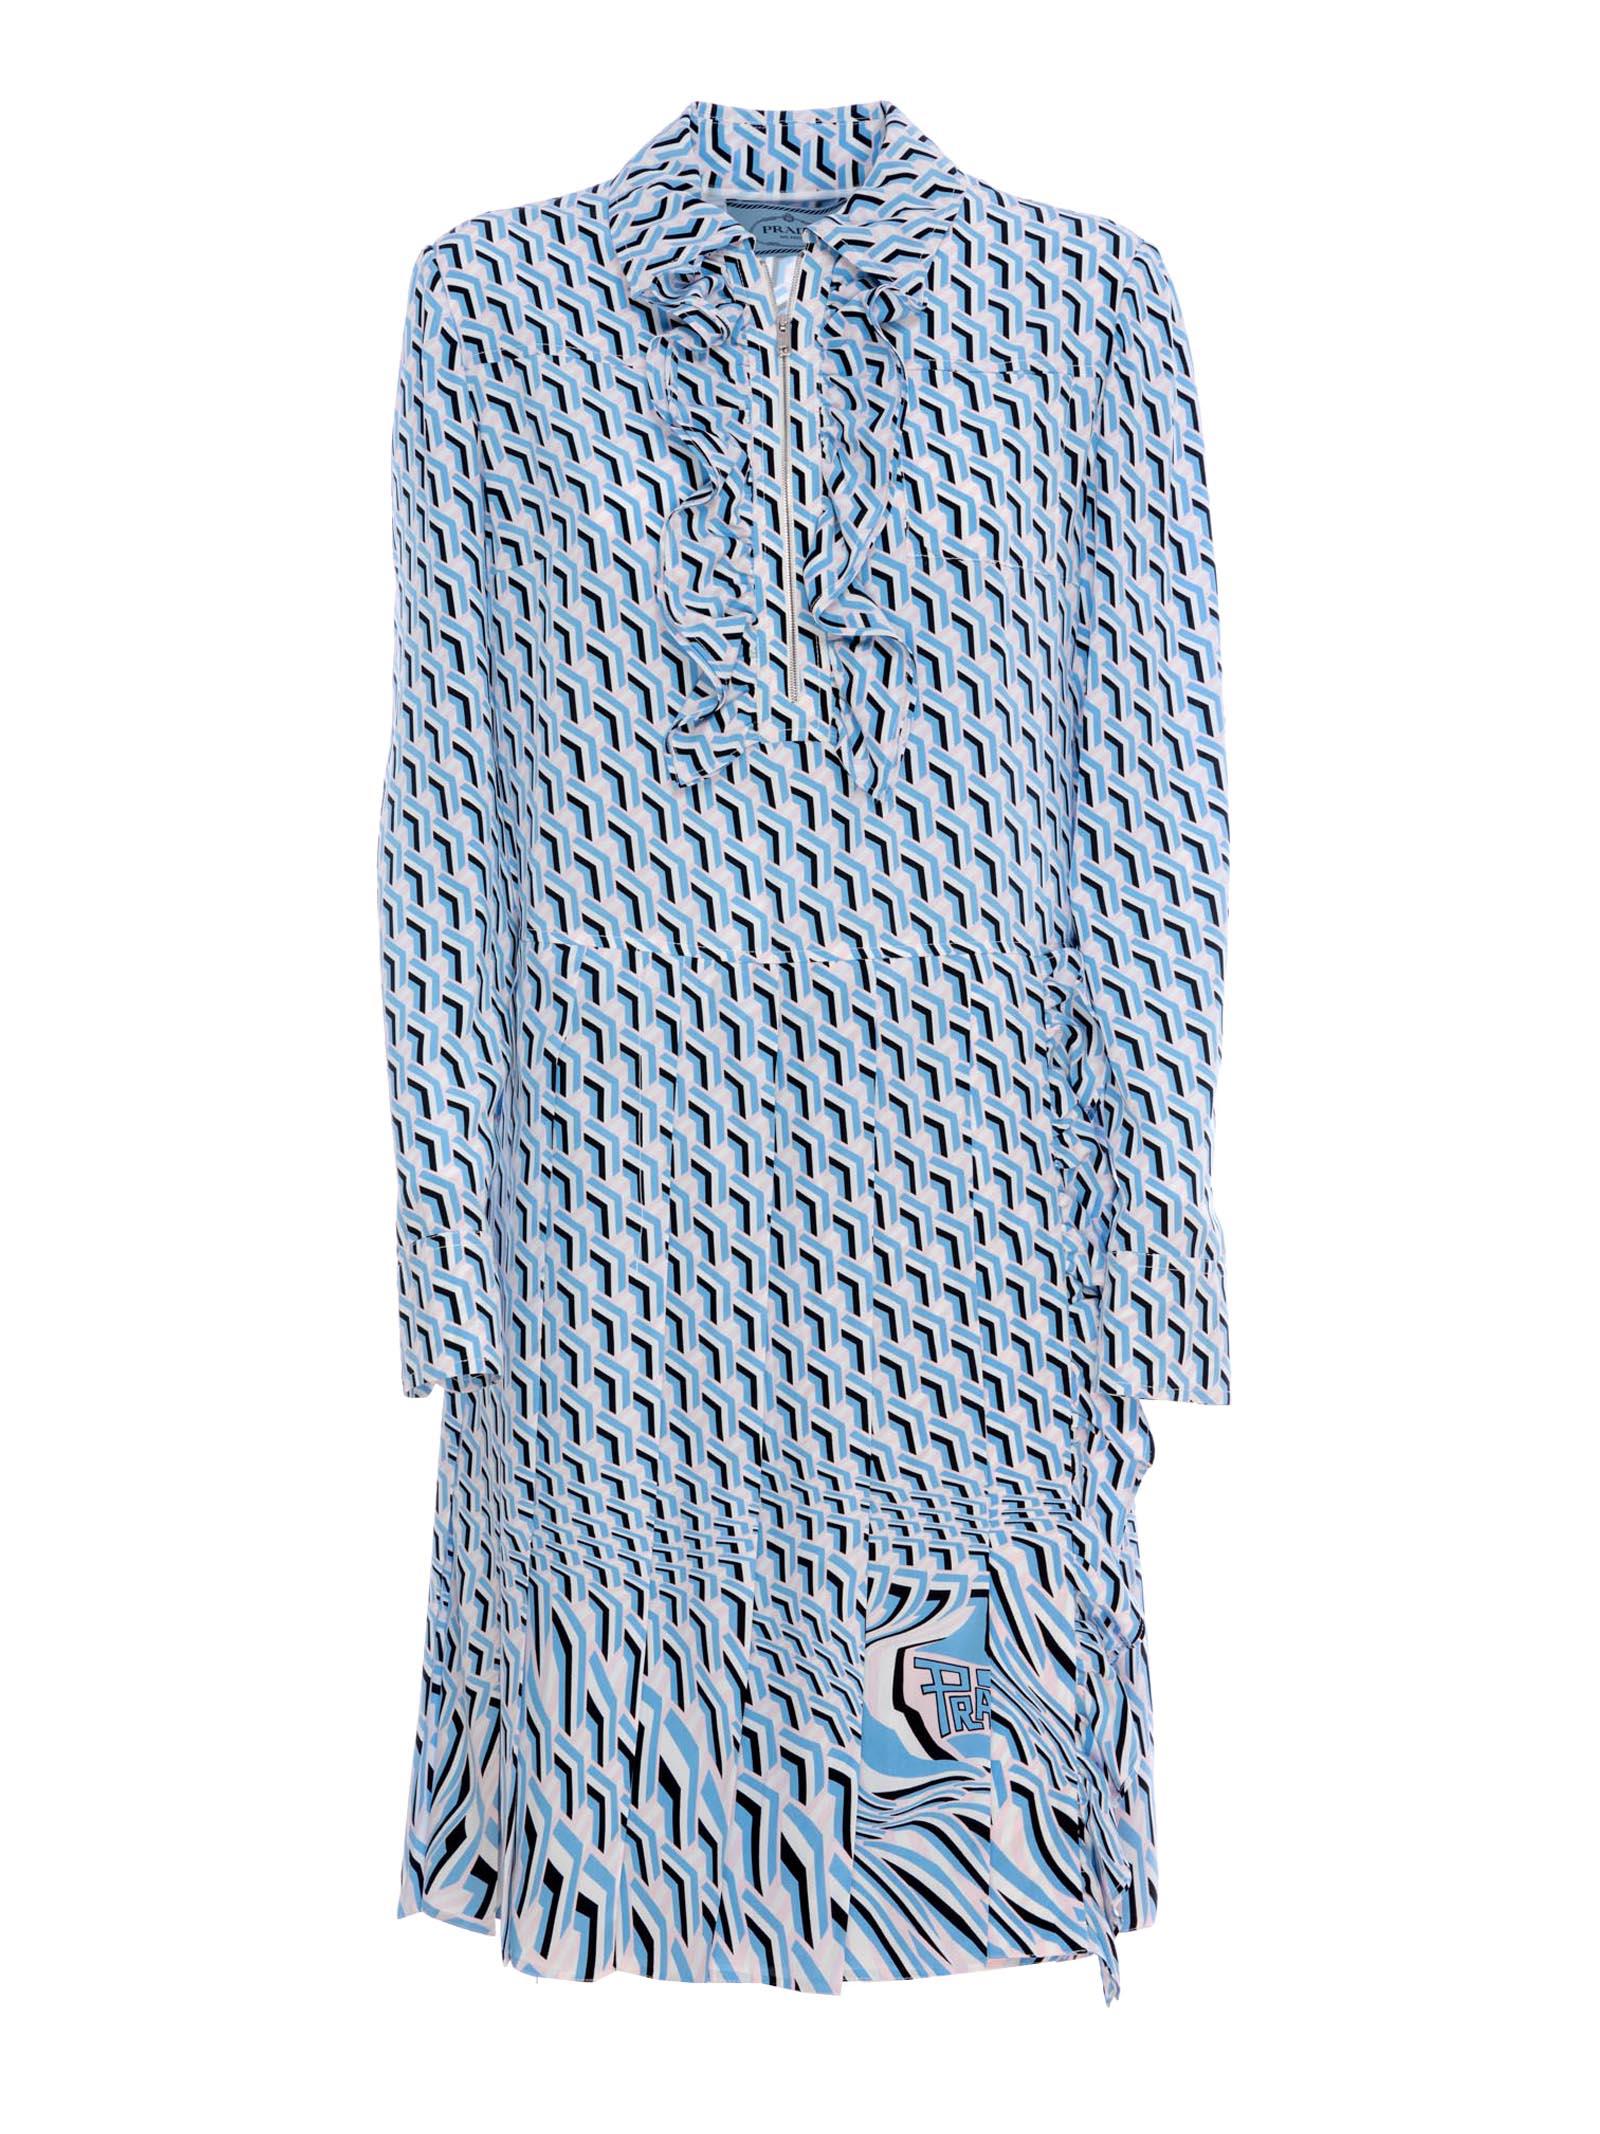 69d3f341facaf6 Prada Slik Printed Dress In Multicolor